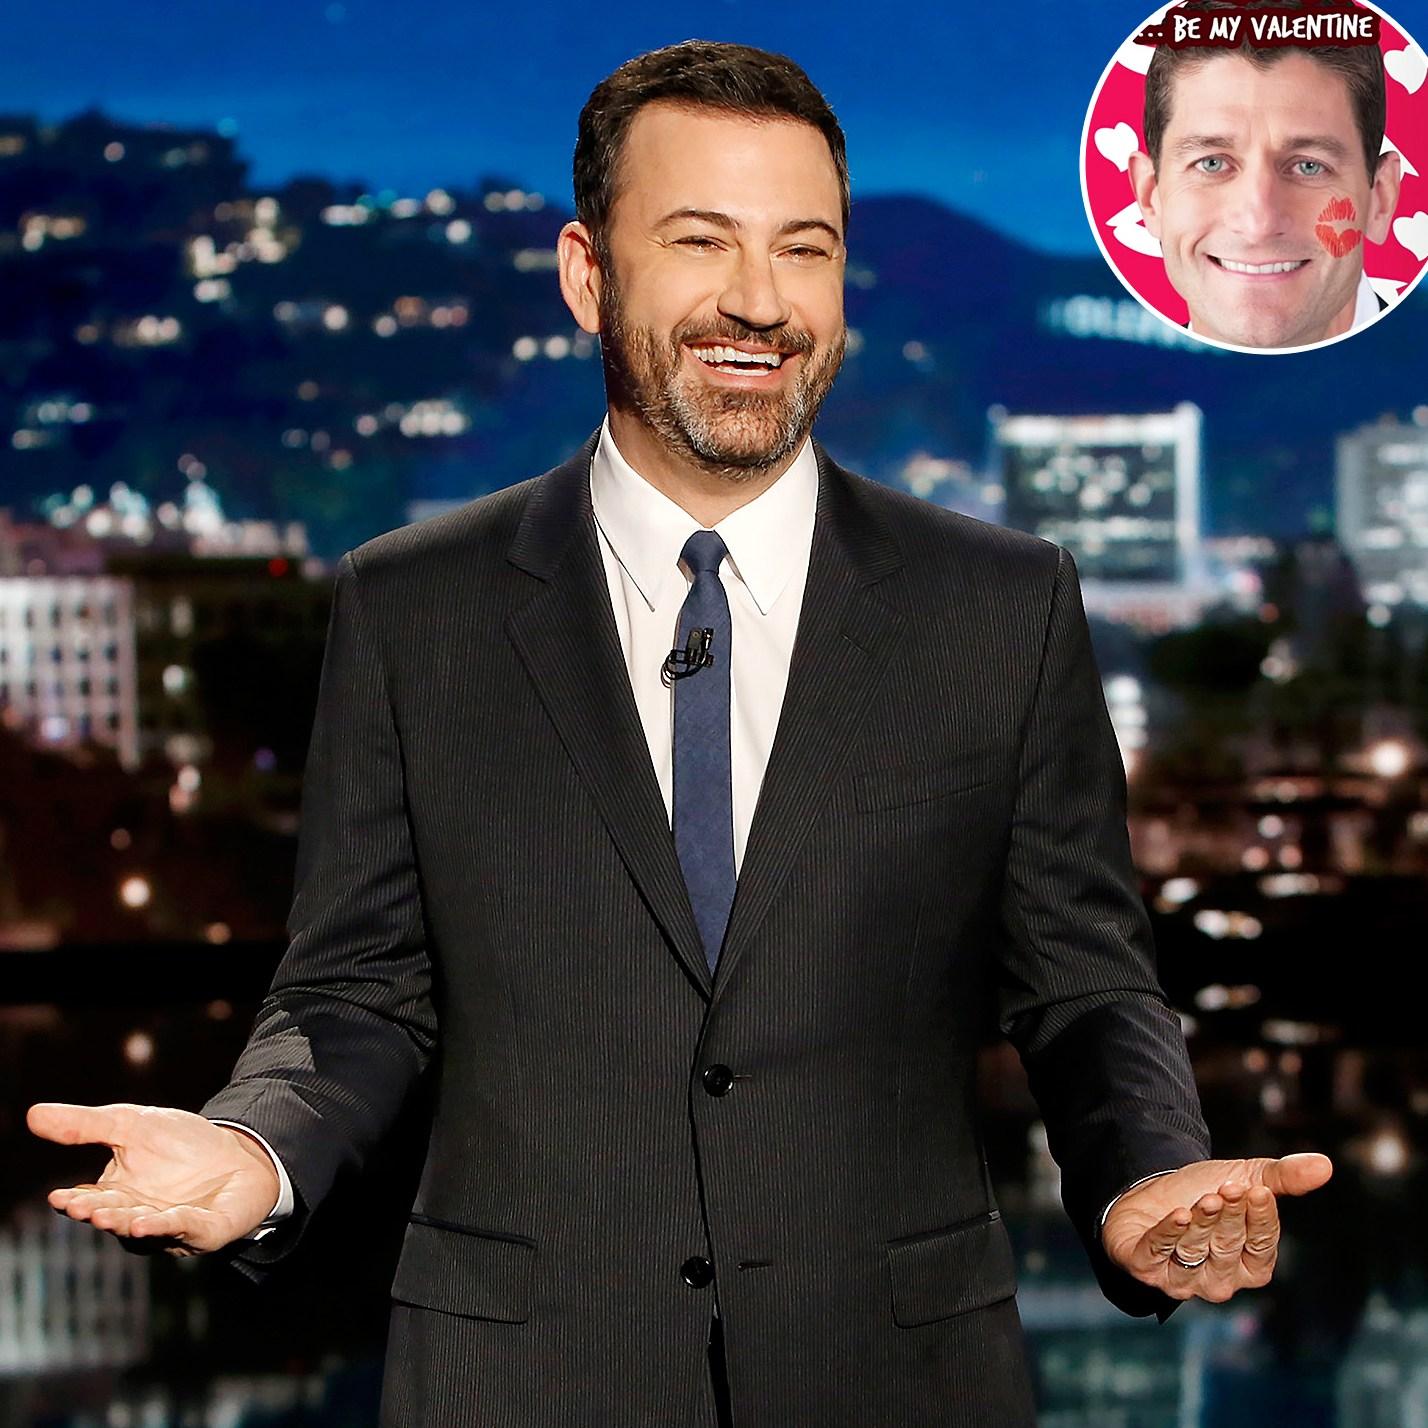 Jimmy Kimmel White House Valentines Day Paul Ryan